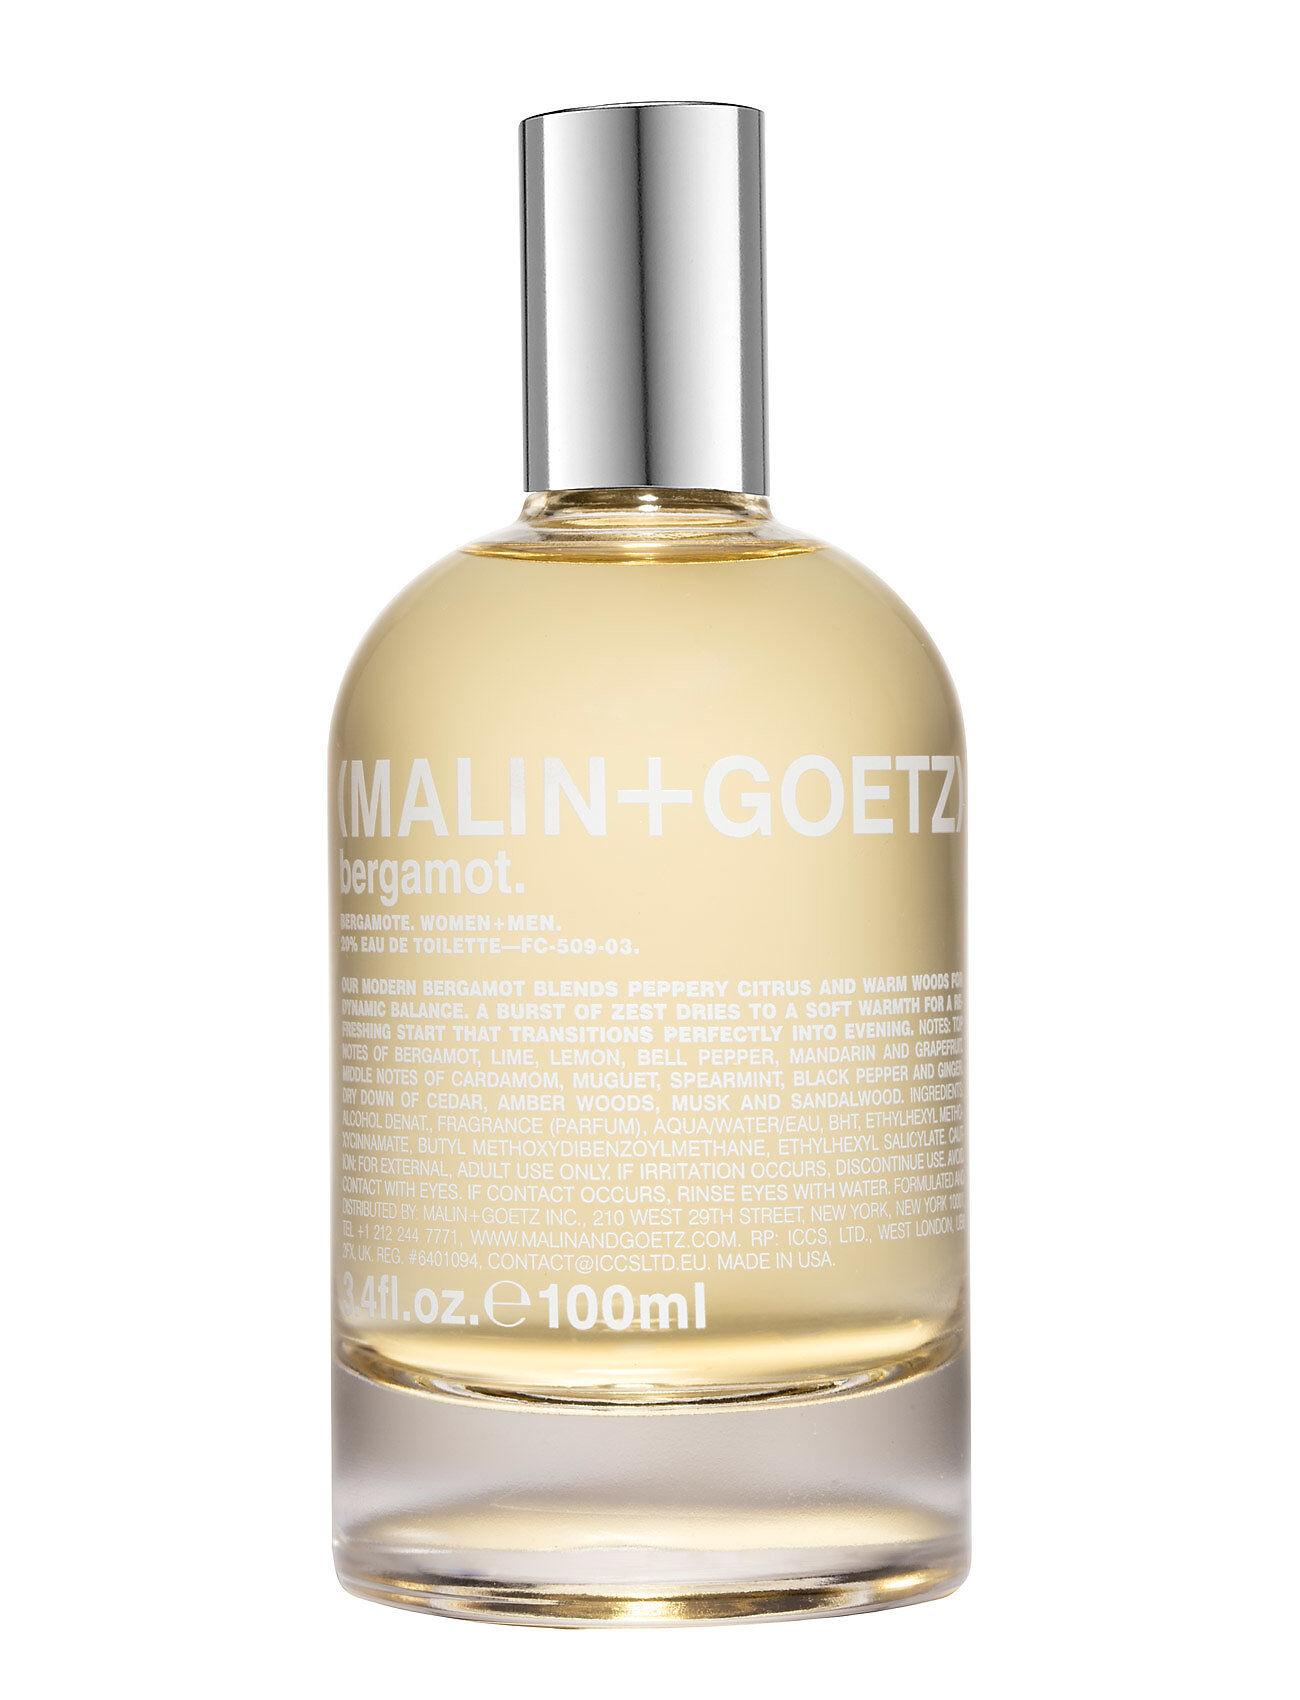 MALIN+GOETZ Bergamot Eau De Toilette Hajuvesi Eau De Parfum Nude MALIN+GOETZ